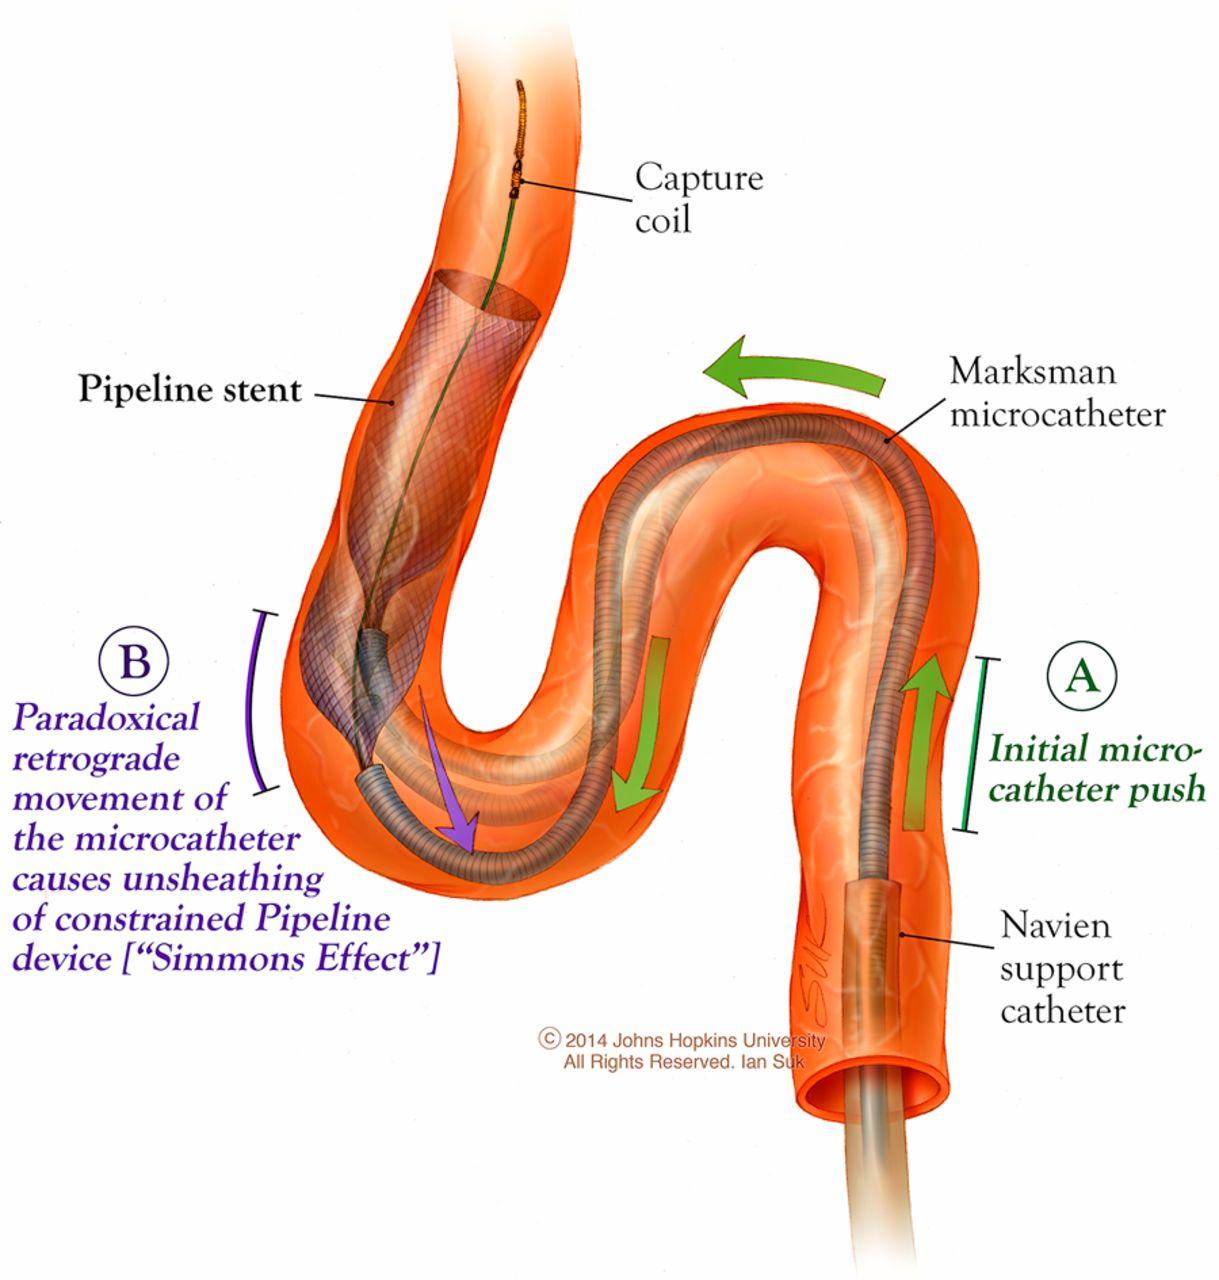 classification of cavernous internal carotid artery tortuosity: a